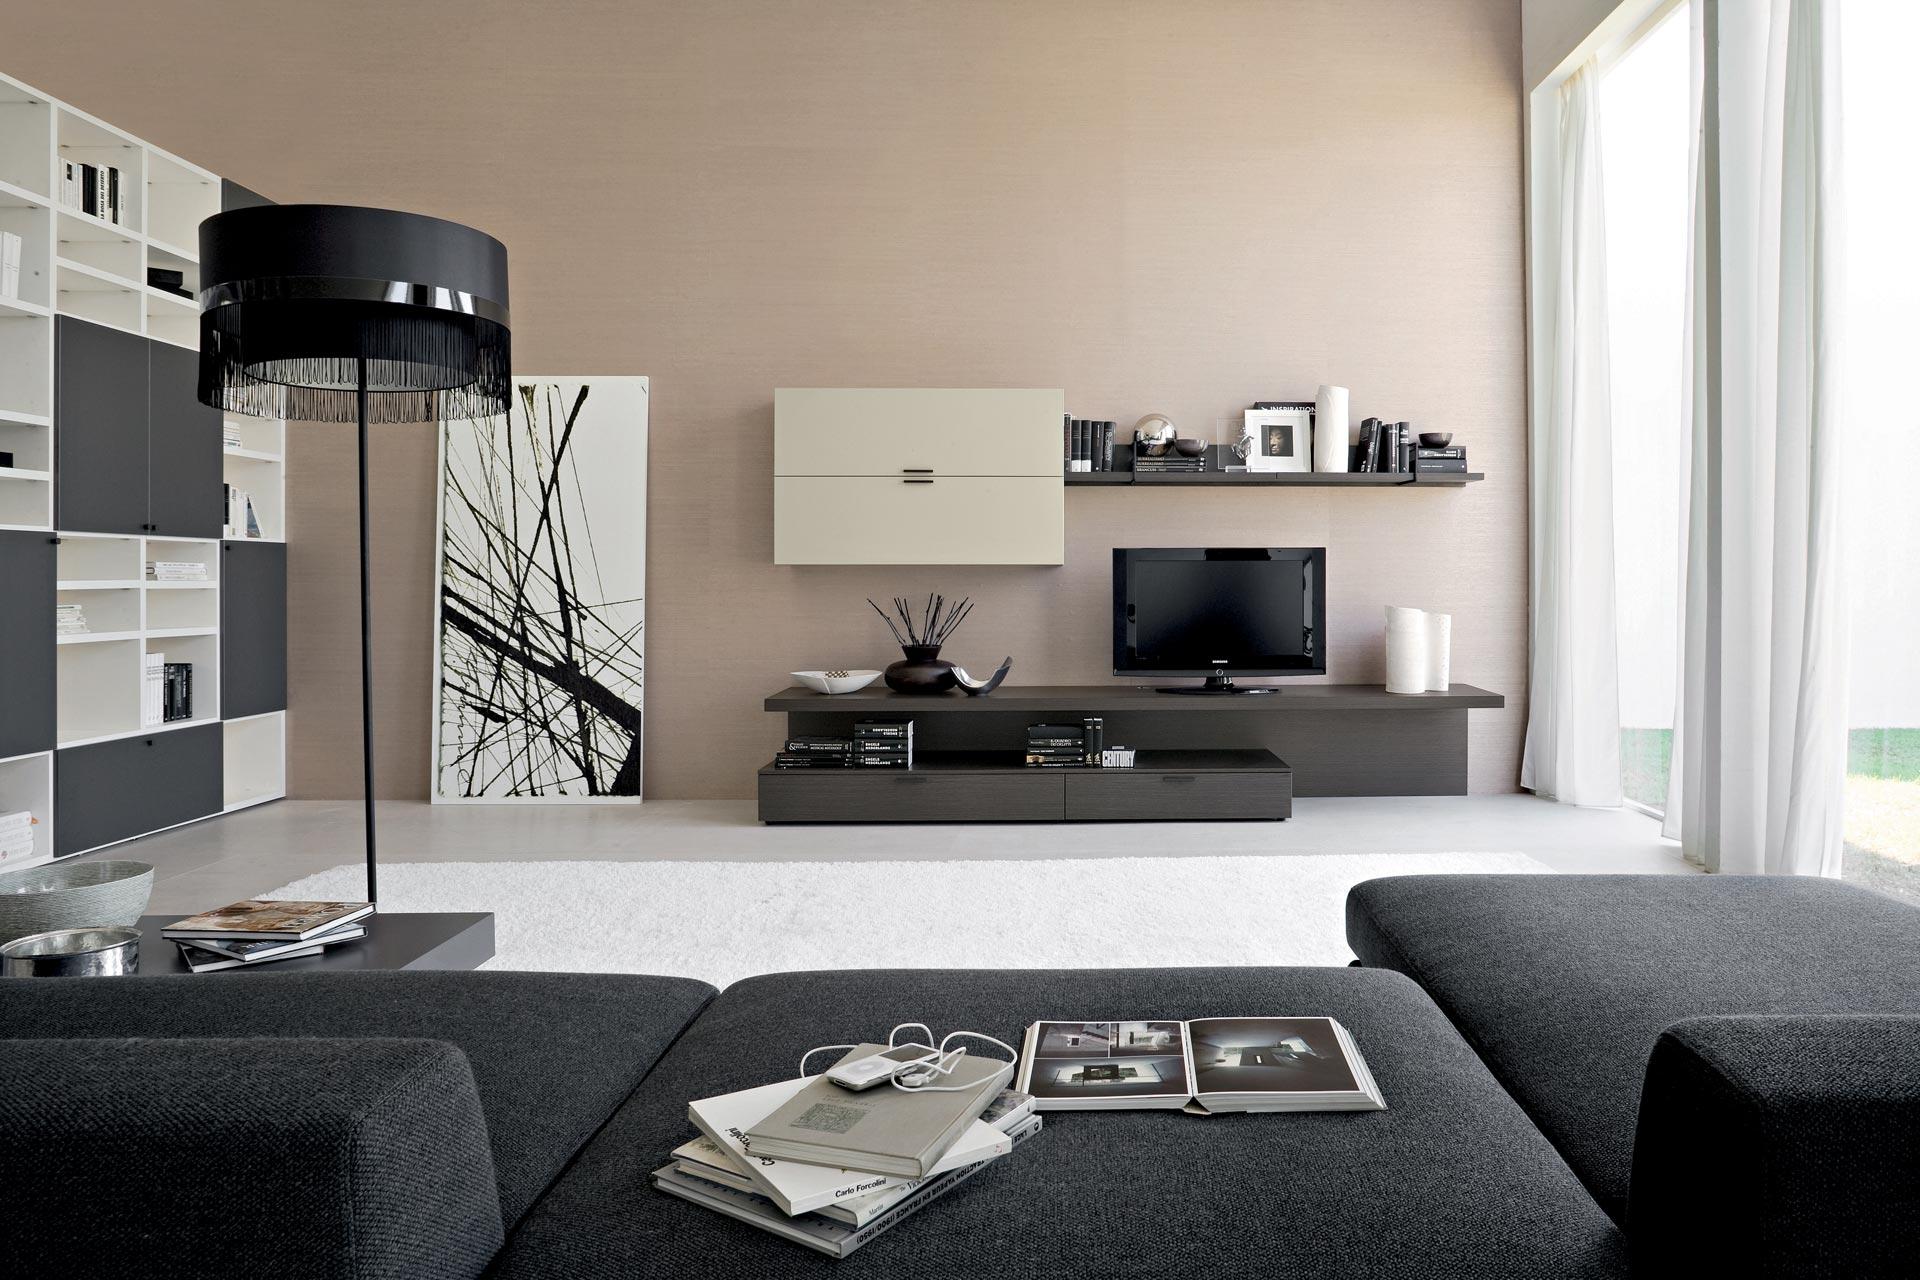 Drawn room dark corner  Decorating Living With Entry